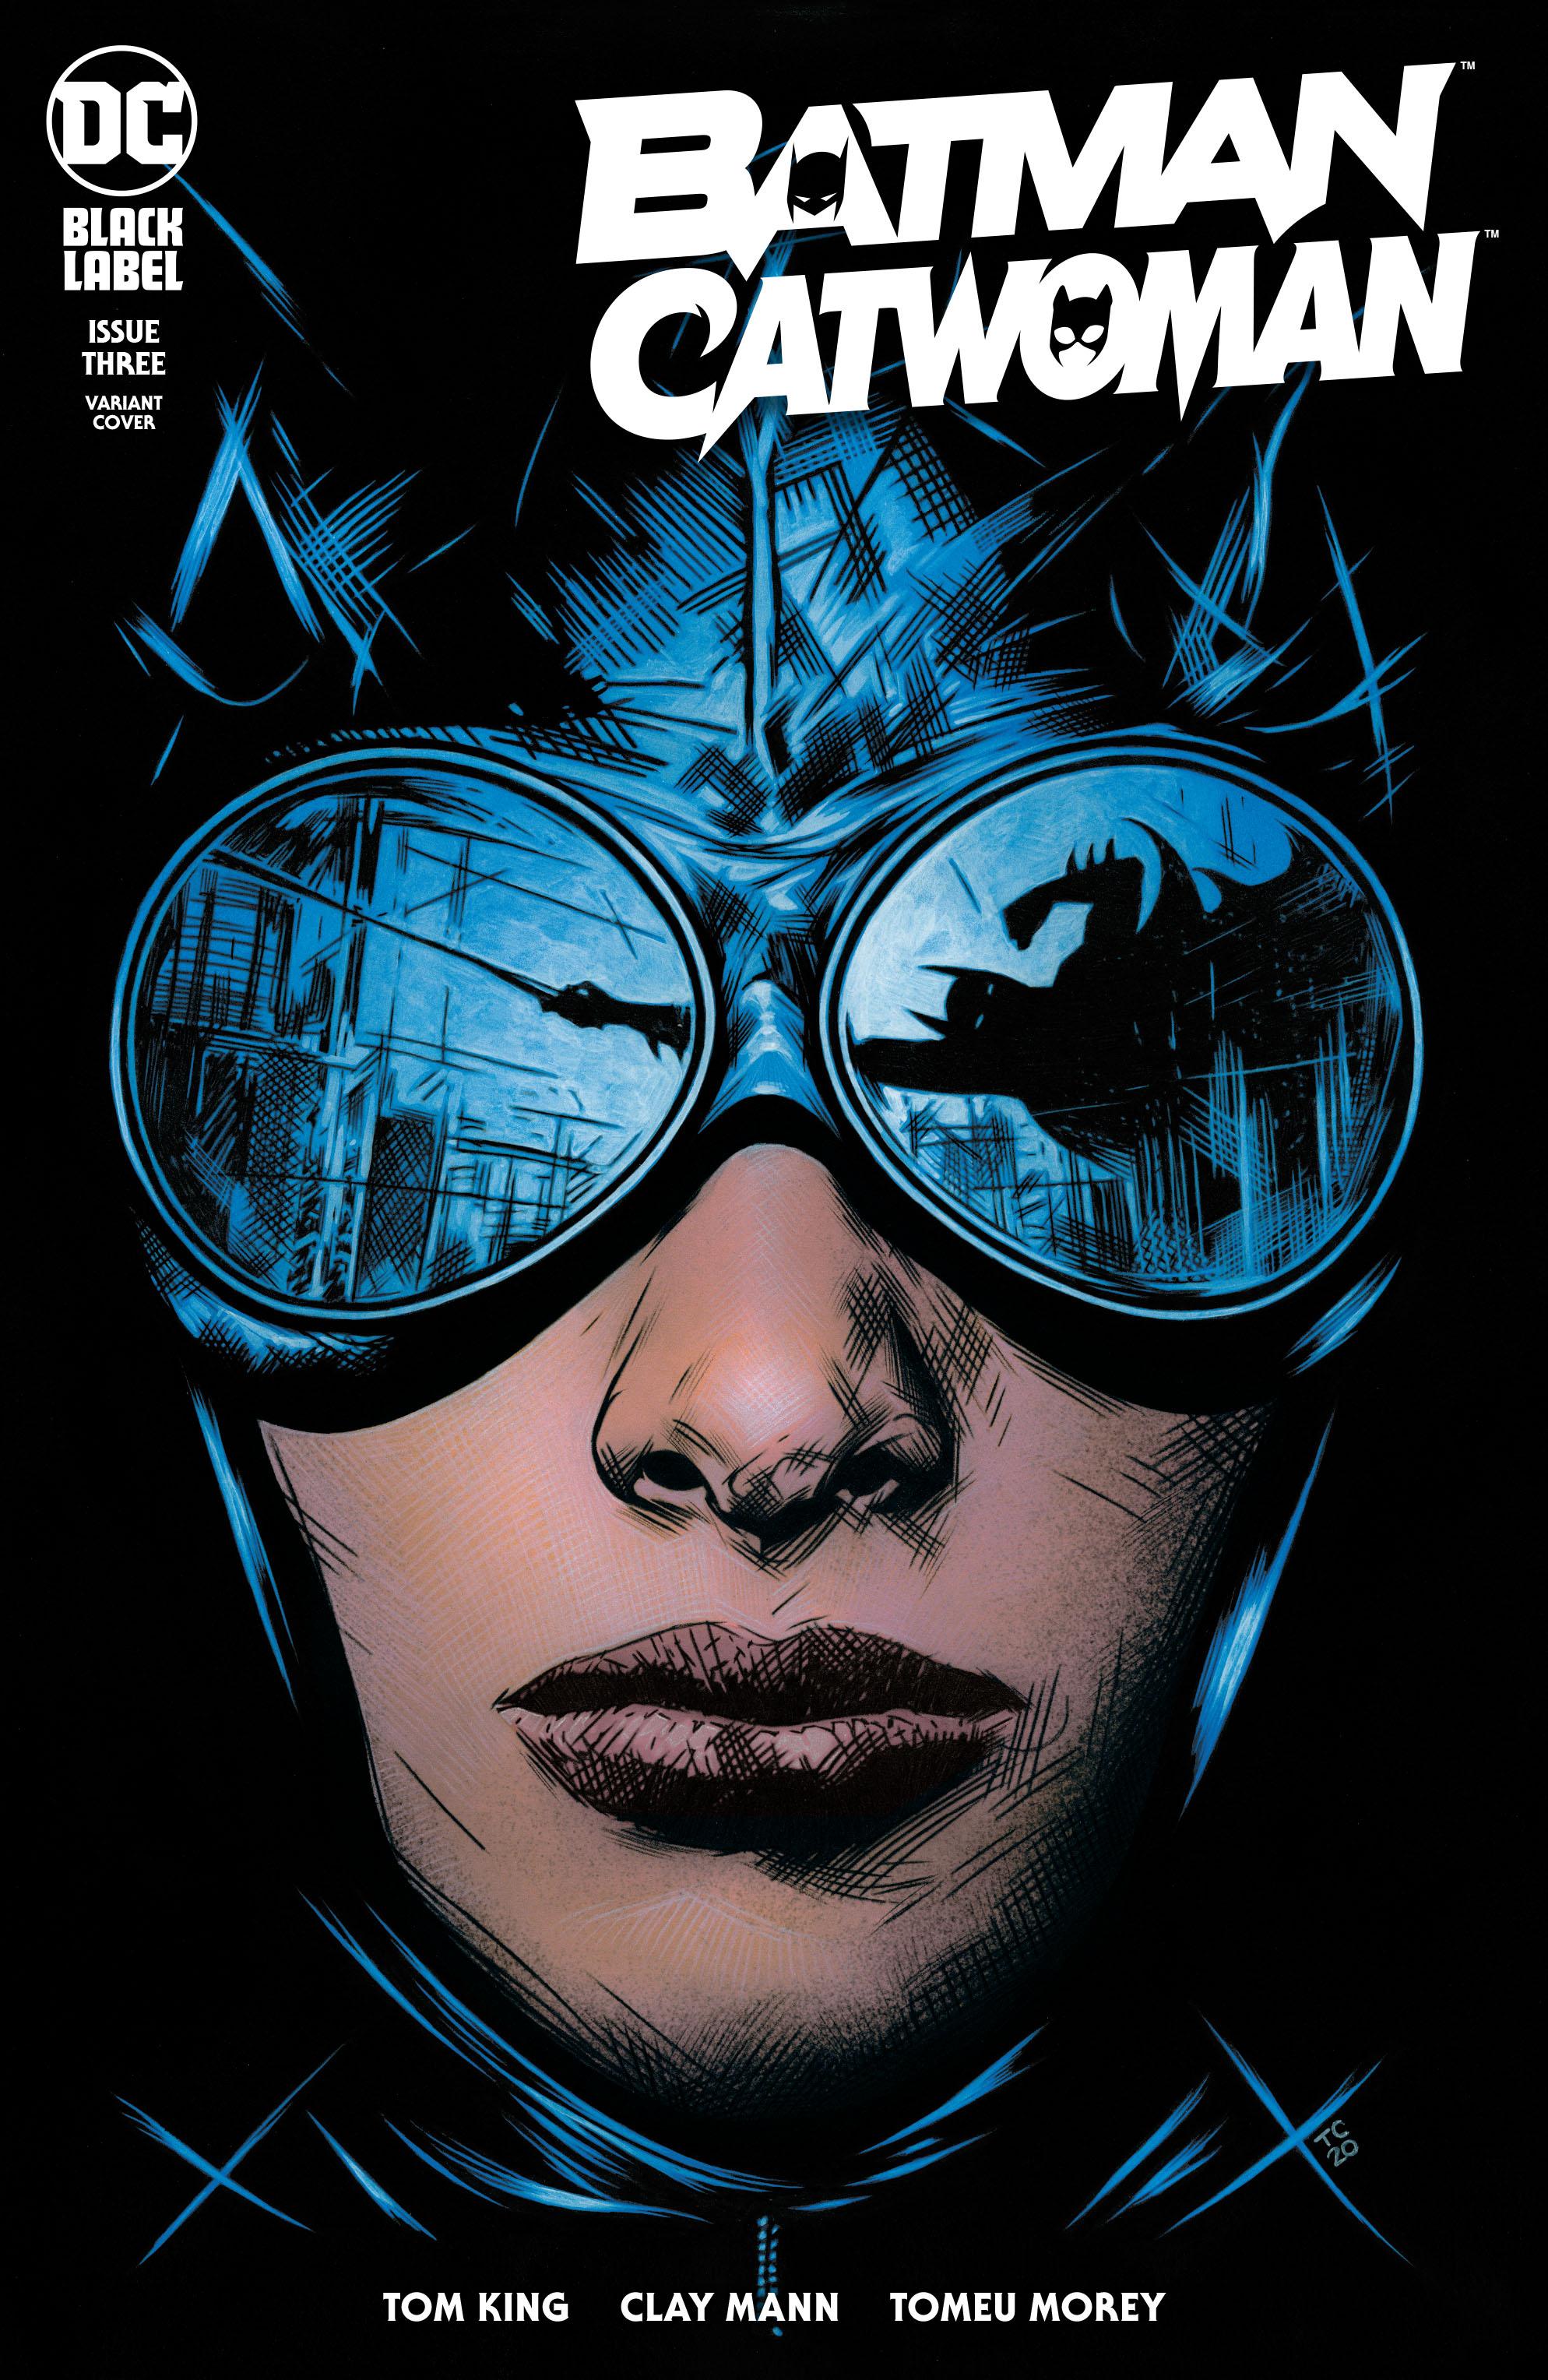 BATMAN CATWOMAN #3 (OF 12) CVR C TRAVIS CHAREST VAR